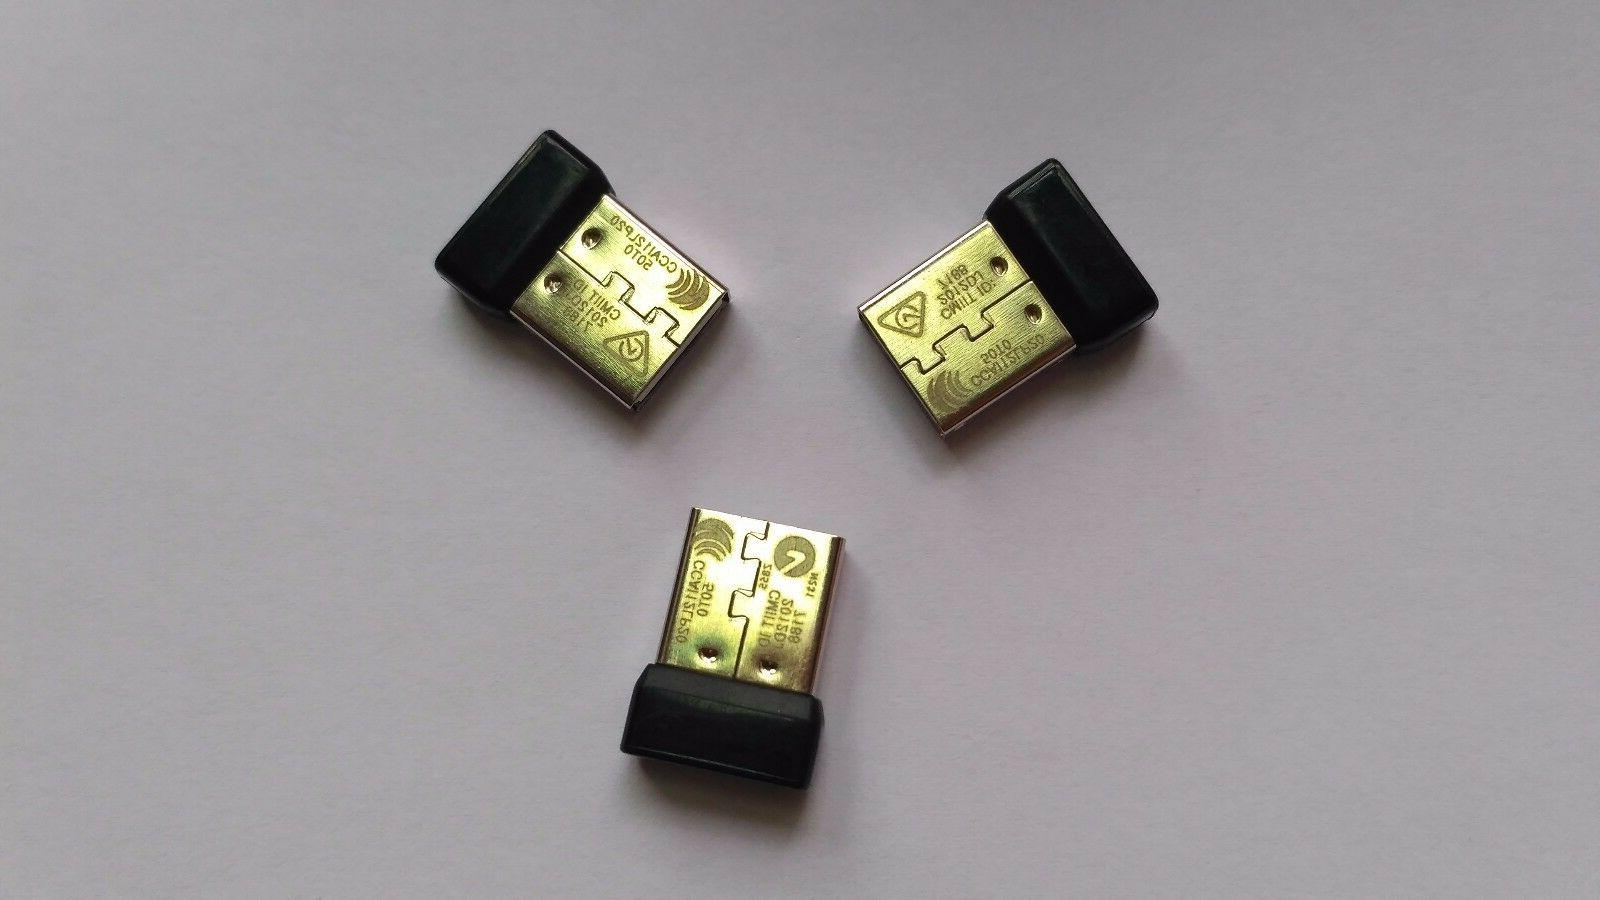 Logitech WIRELESS Receiver USB adapter for M165 M170 M171 mk